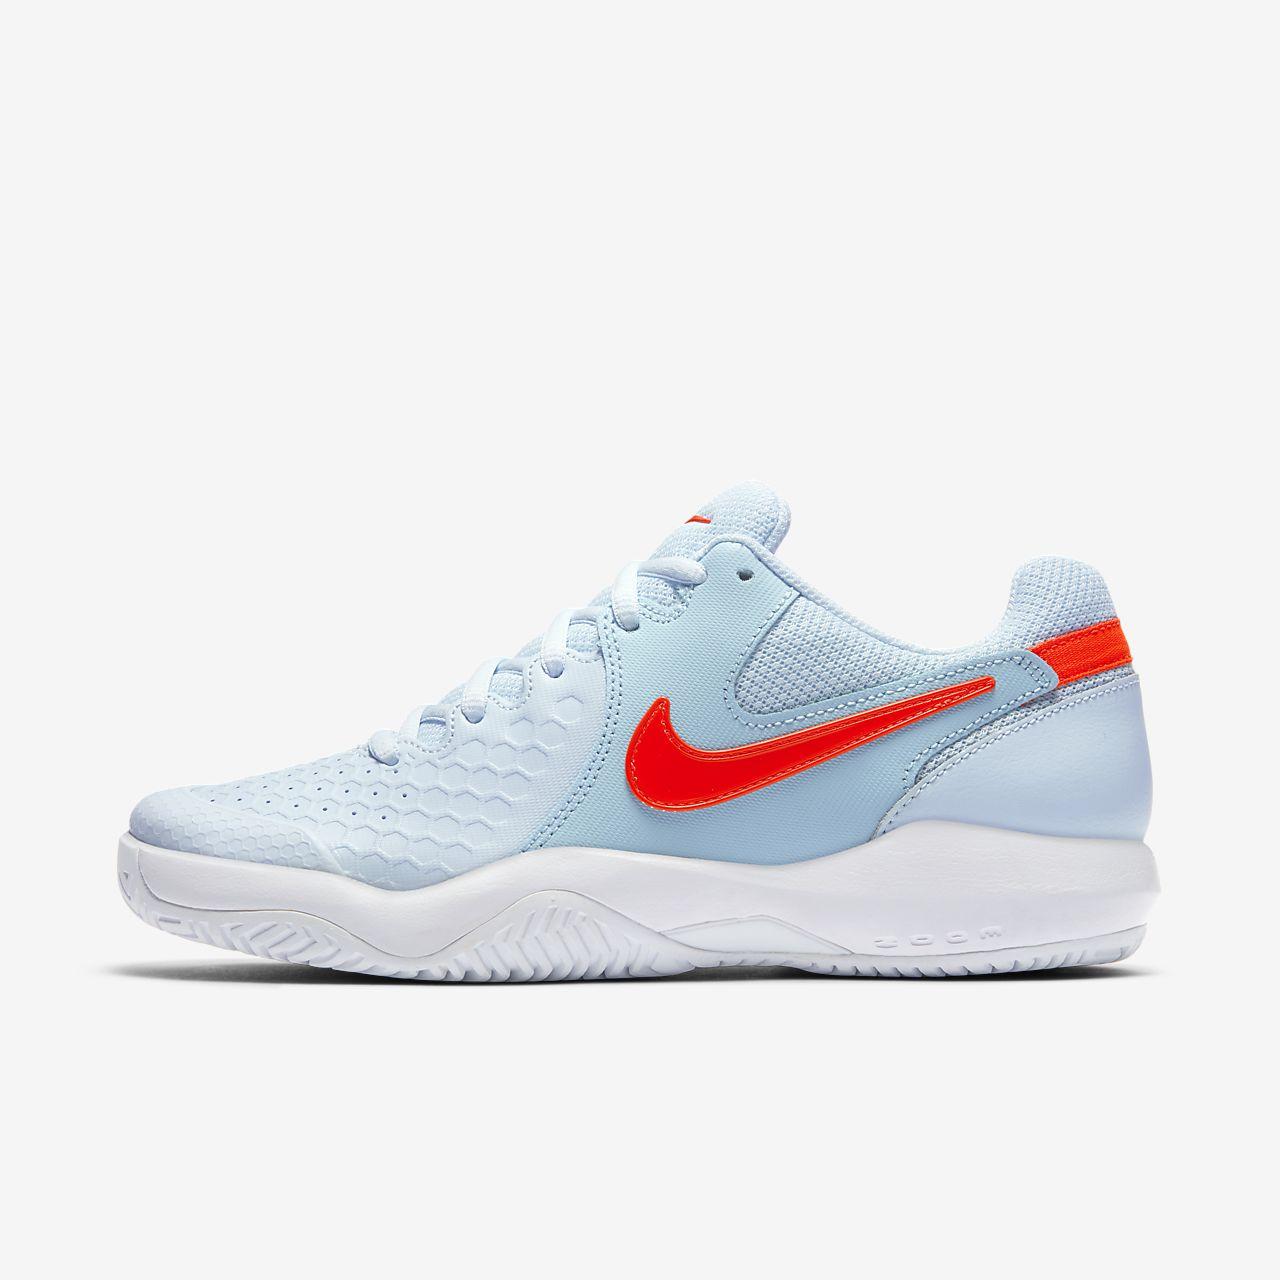 Mujer Air Cancha Dura Zoom De Tenis Calzado Para Nikecourt xCS1PBUqw